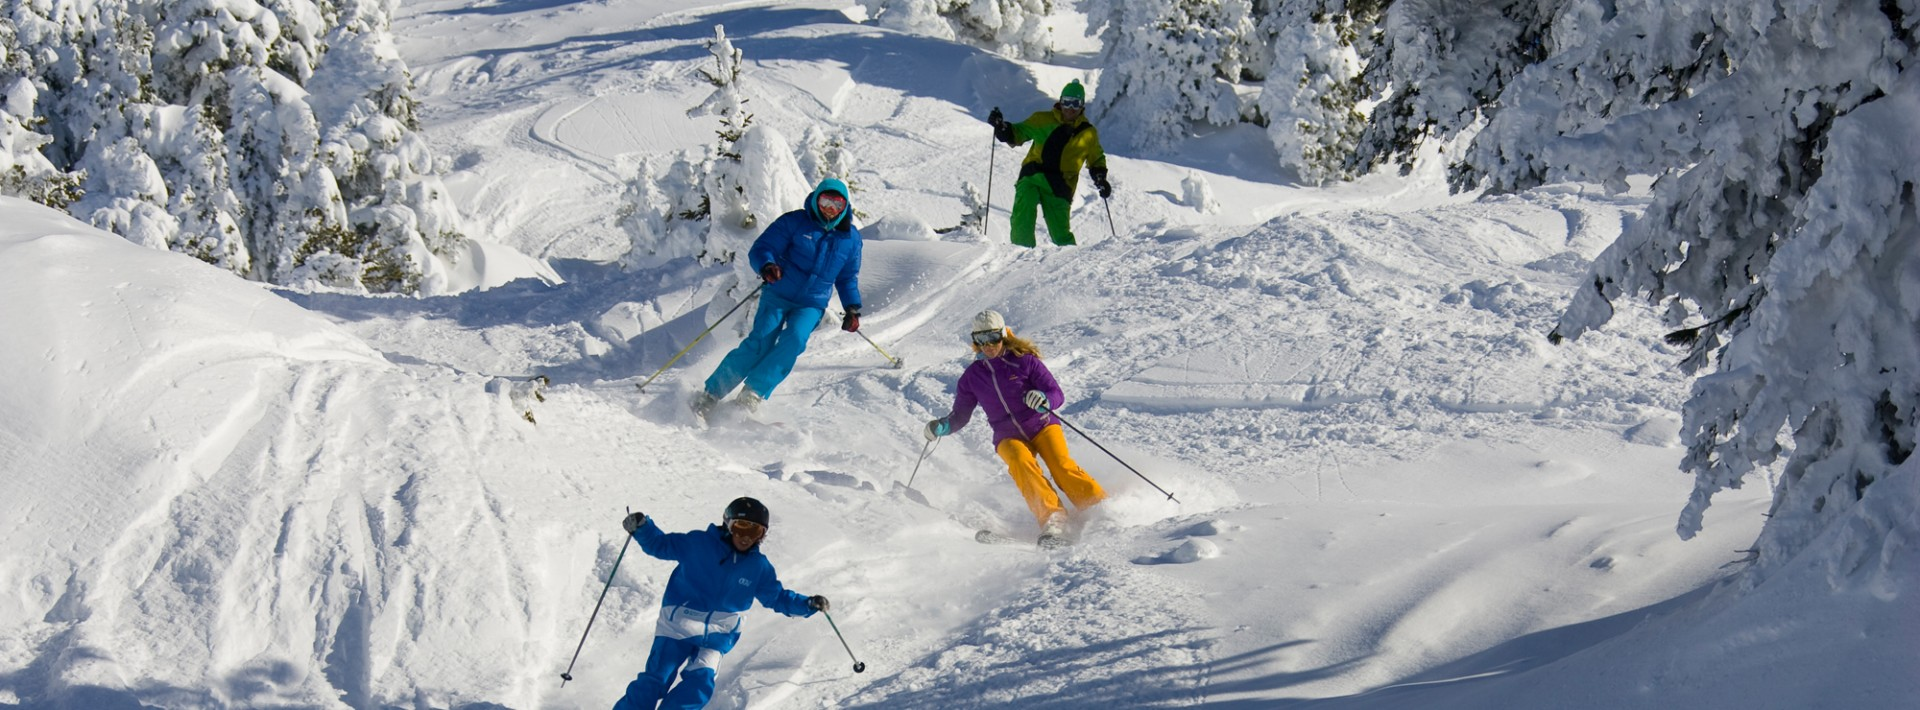 Ski alpin Chamrousse